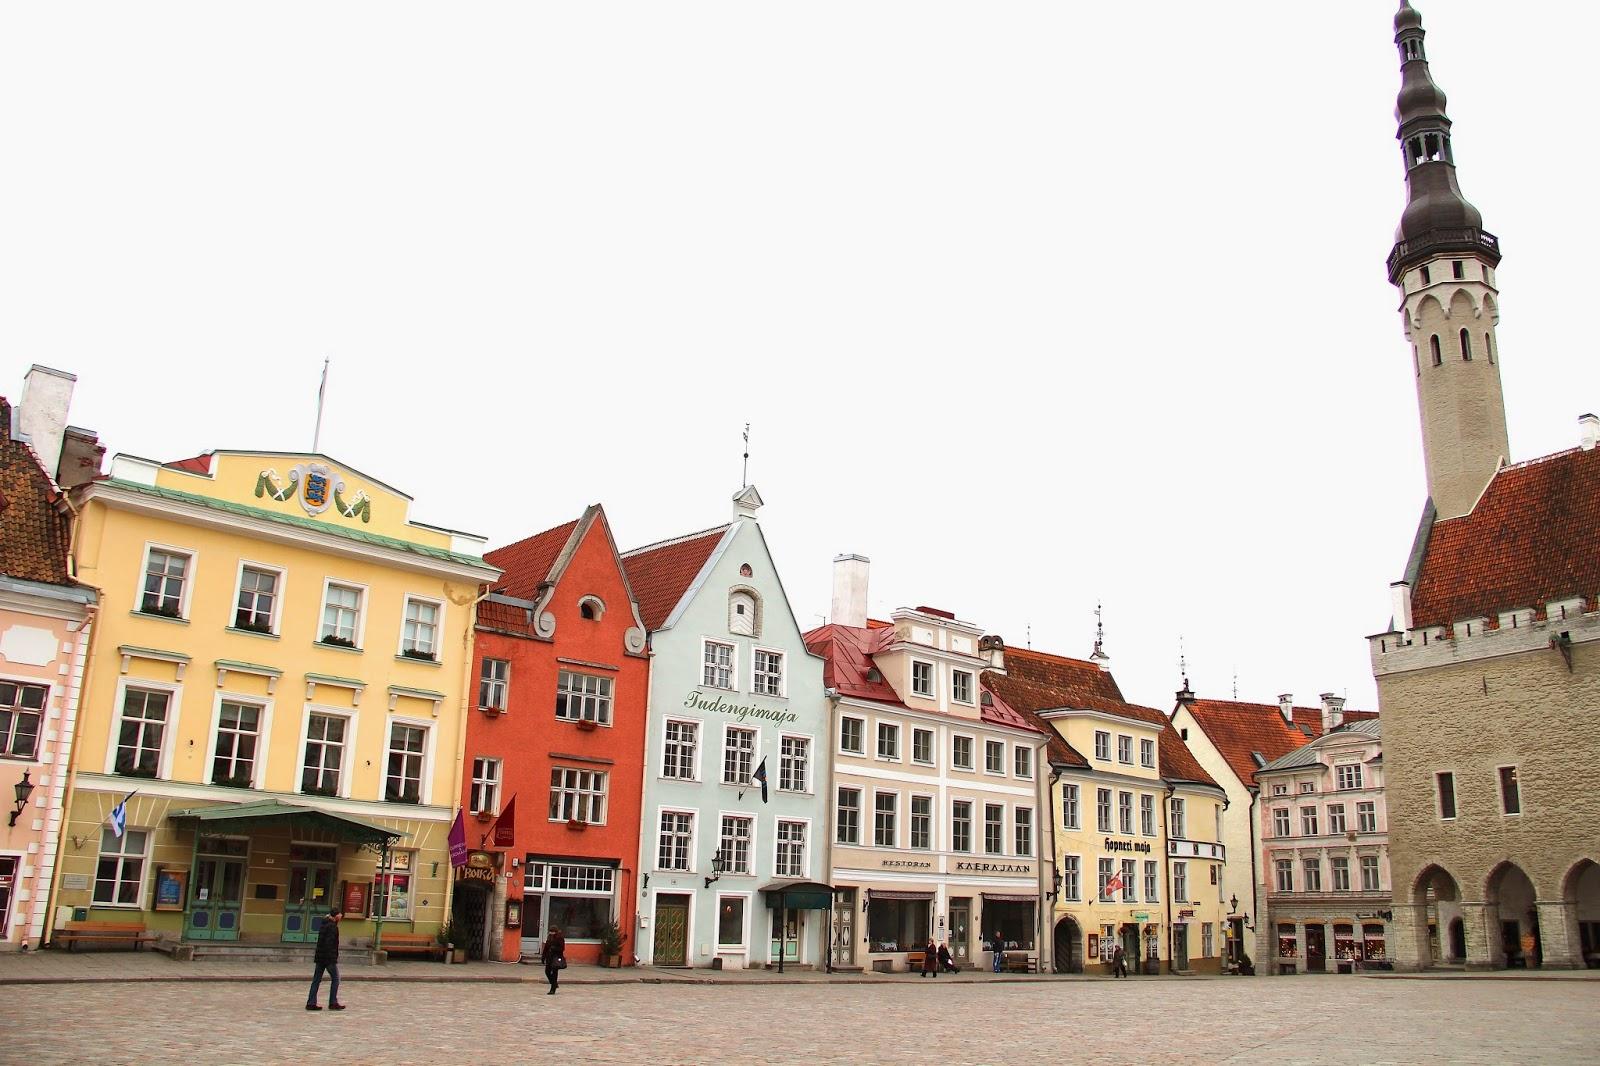 Raekoja Plats Town Hall Square